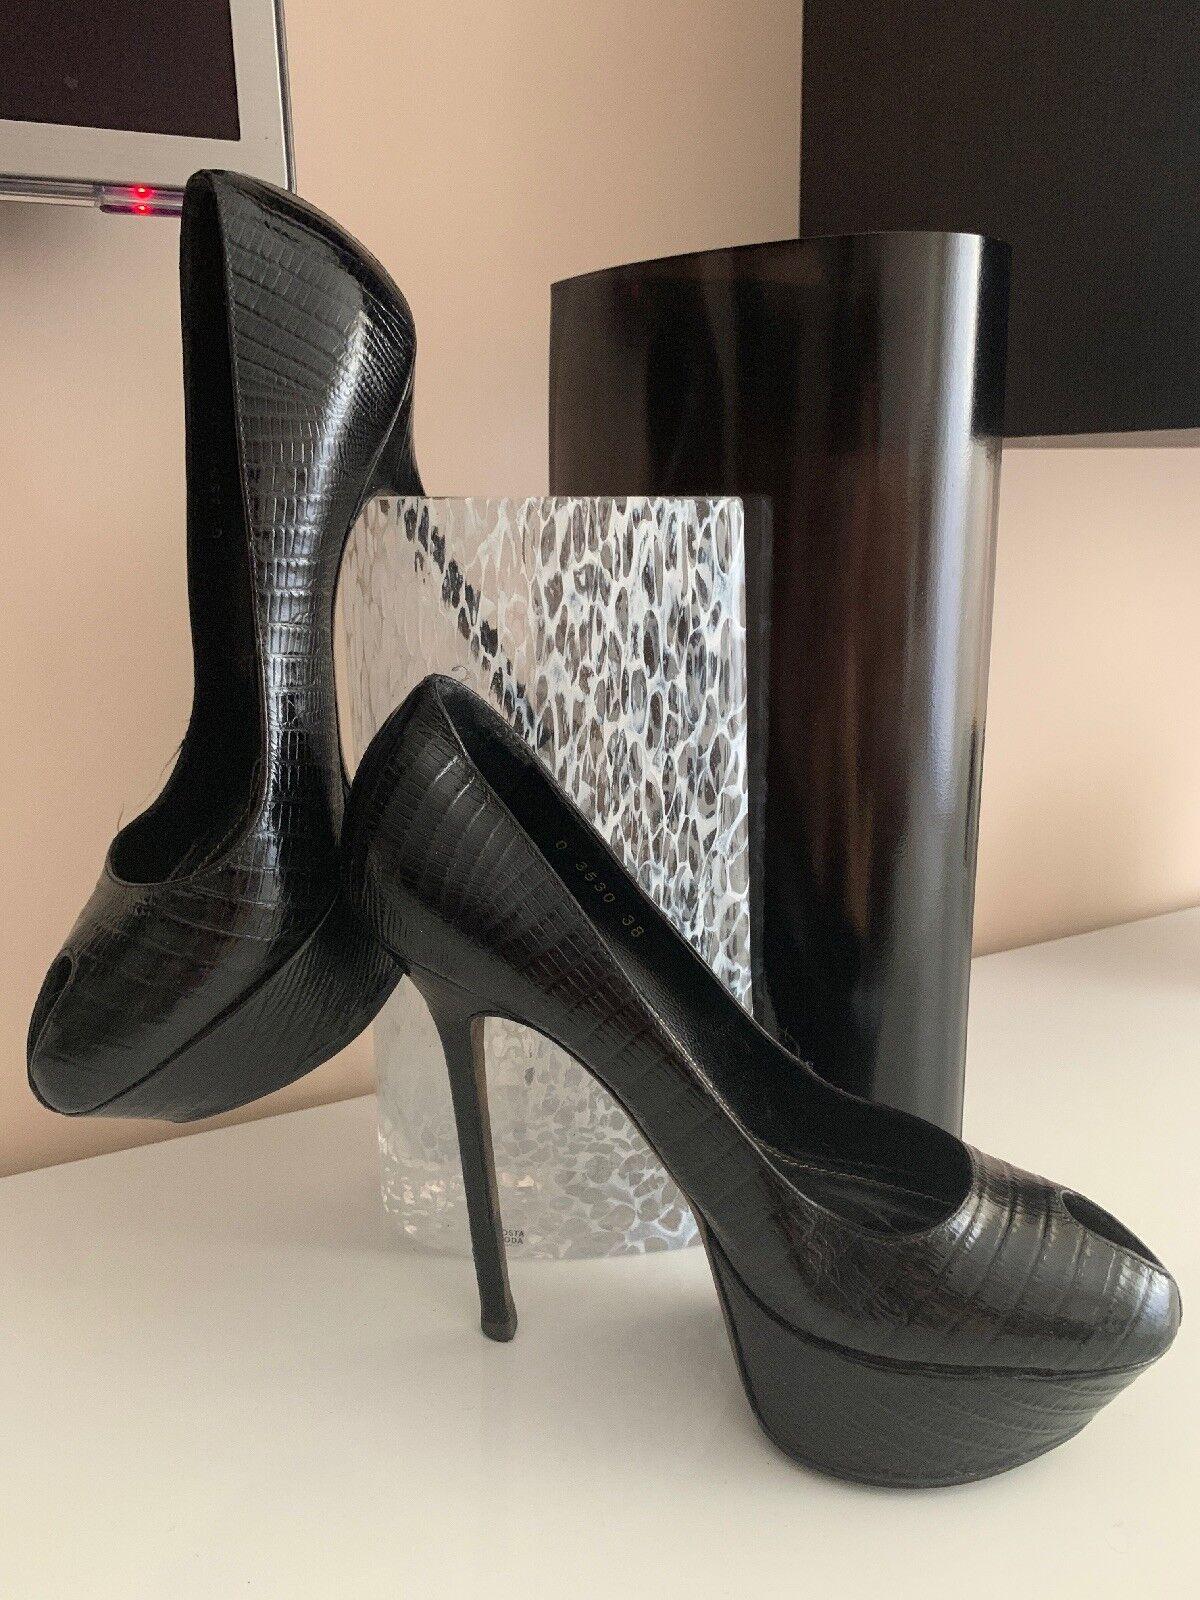 Sergio Rossi Peep Toe  Platform Heels Pumps Snake Python Taille 38.5